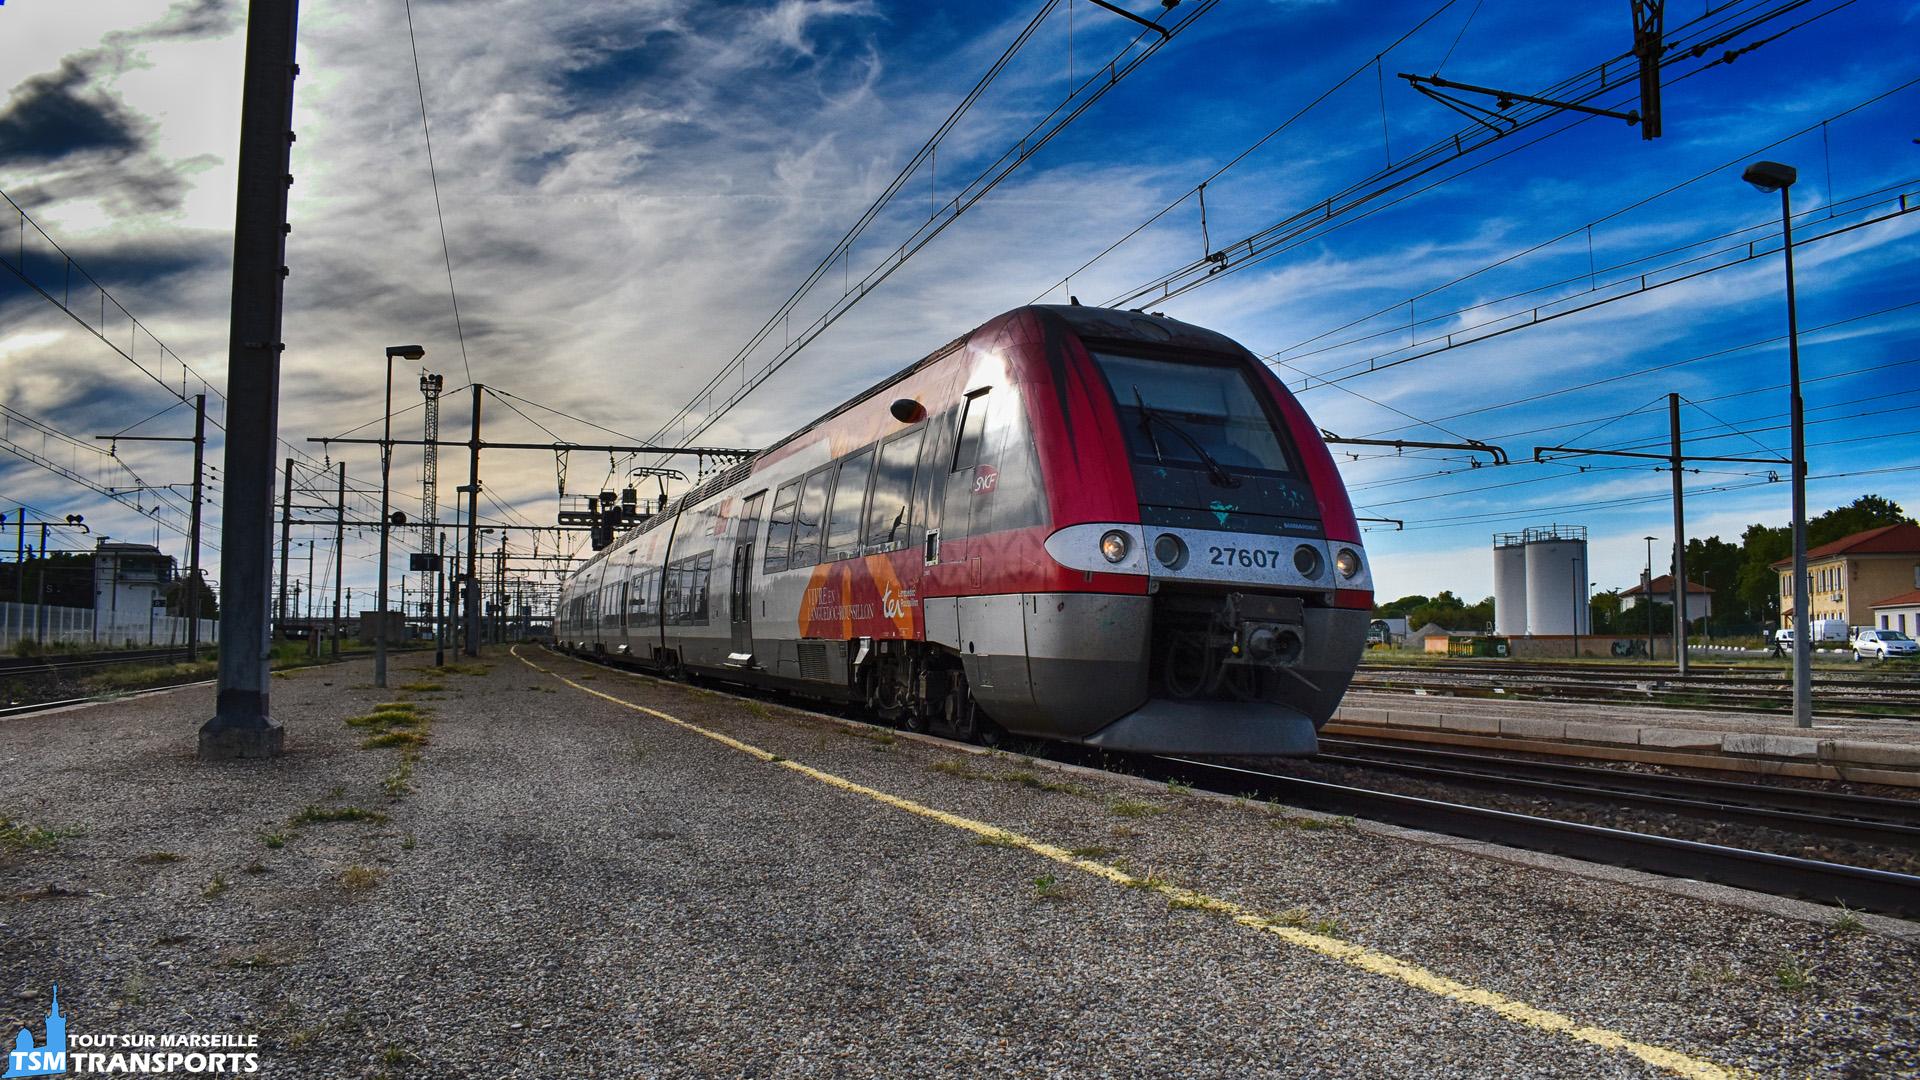 Bombardier AGC (Z27500) SNCF n°27607